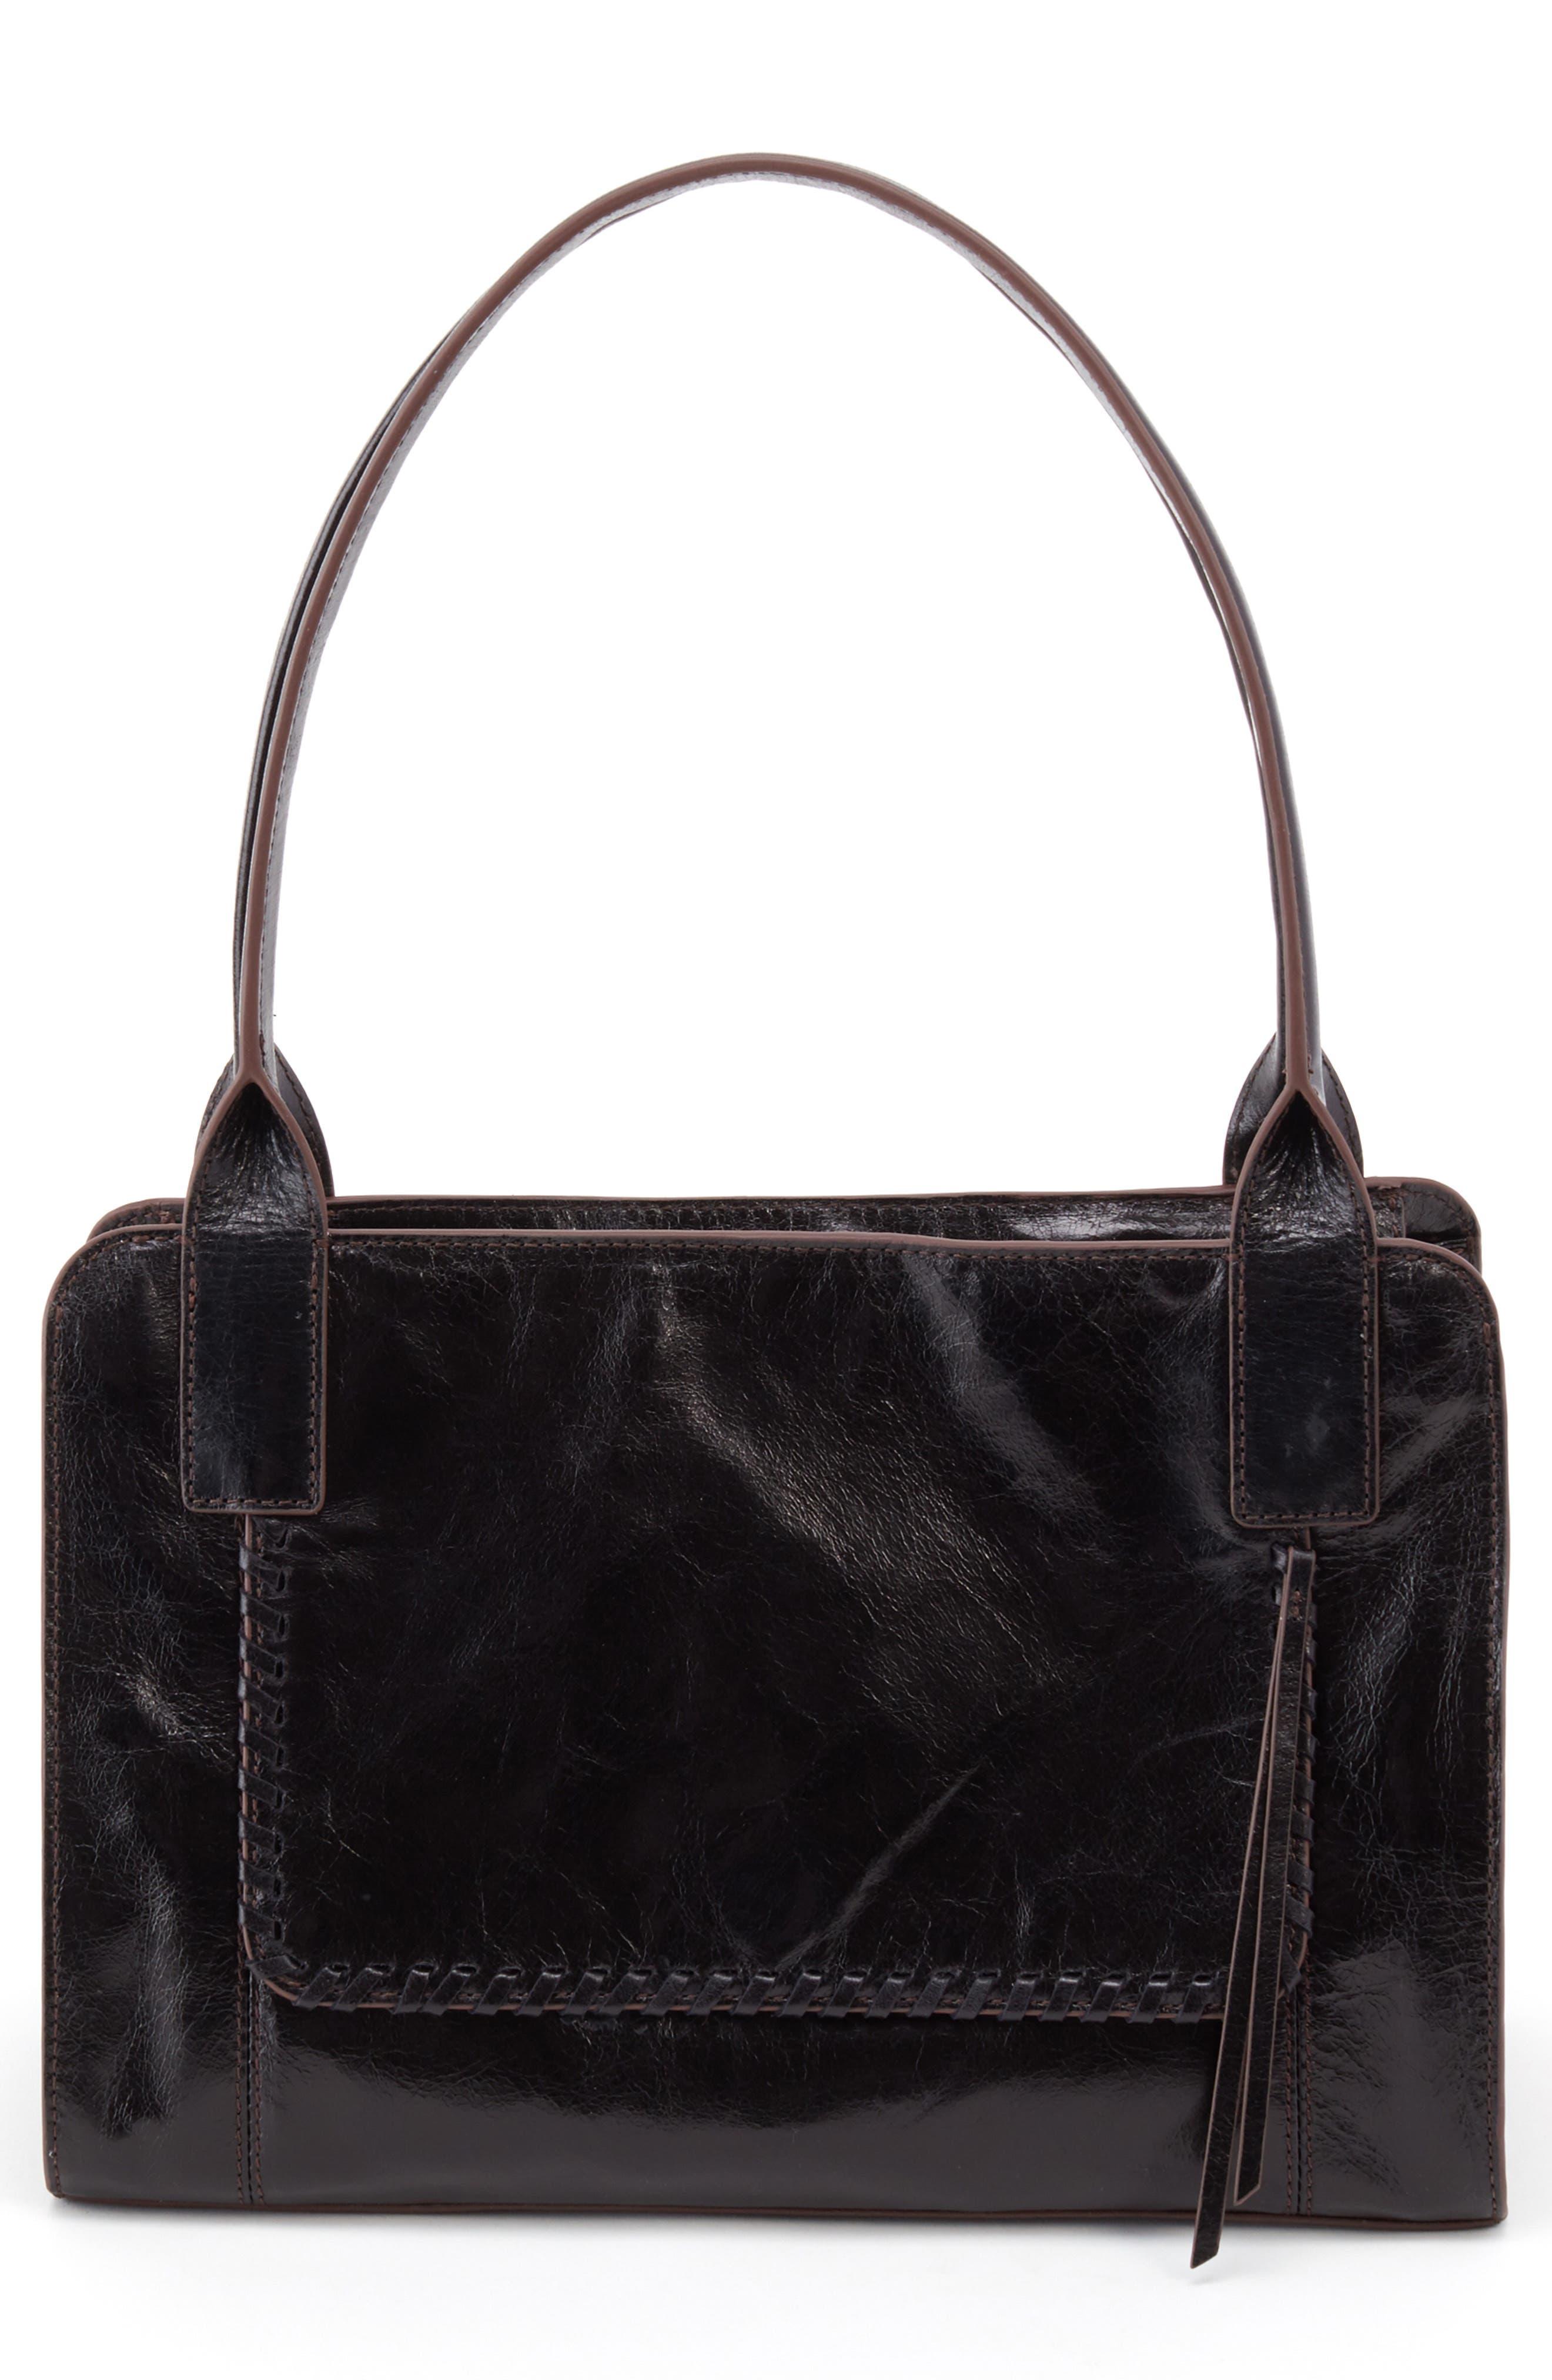 Splendor Leather Satchel,                         Main,                         color, 001